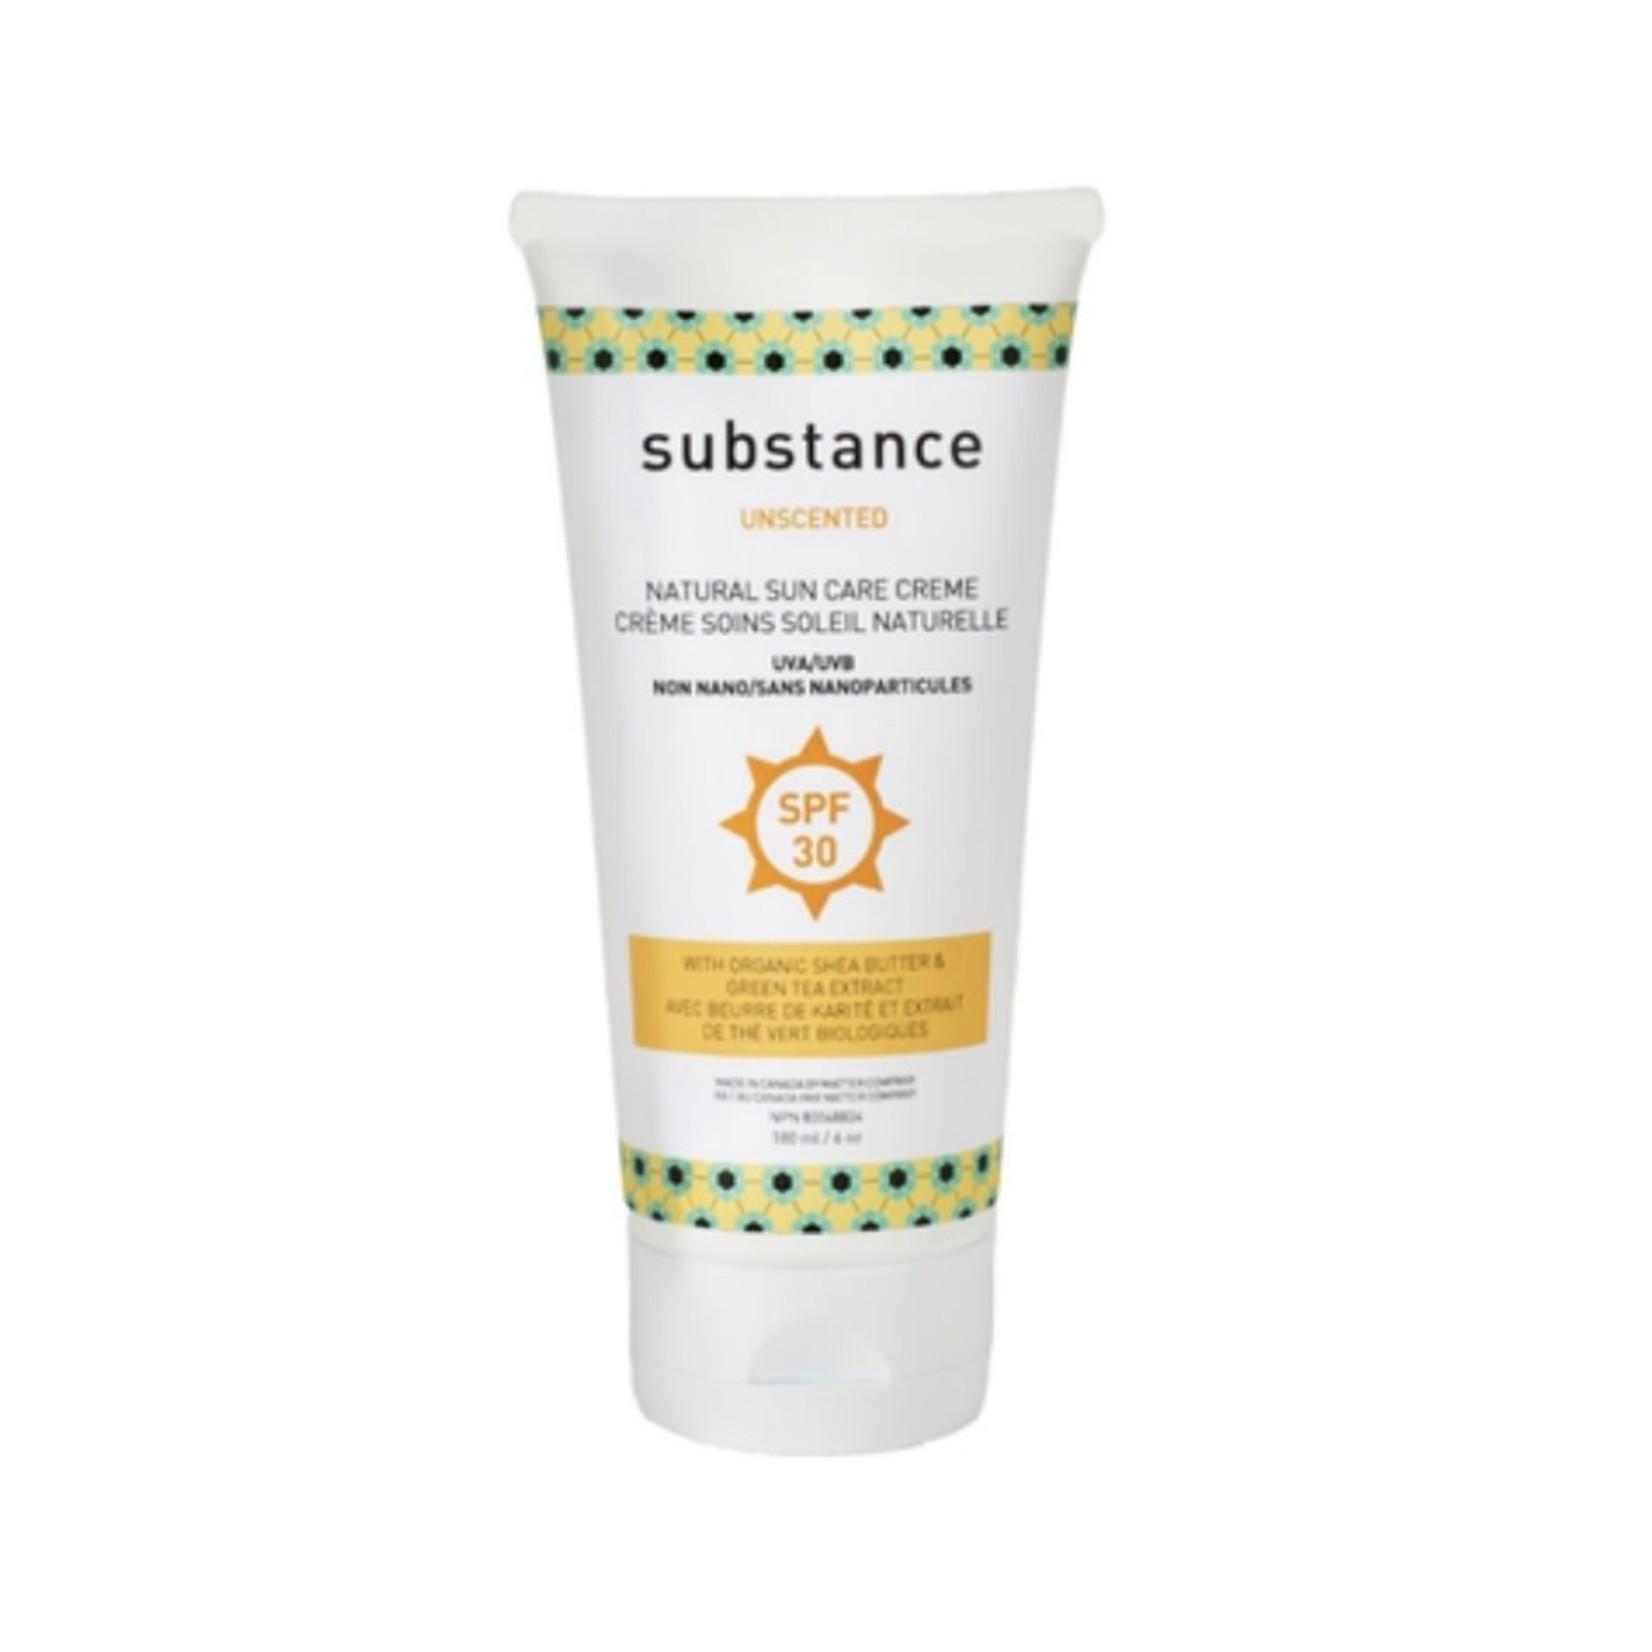 Substance Substance Baby Sunscreen SPF 30 180ml